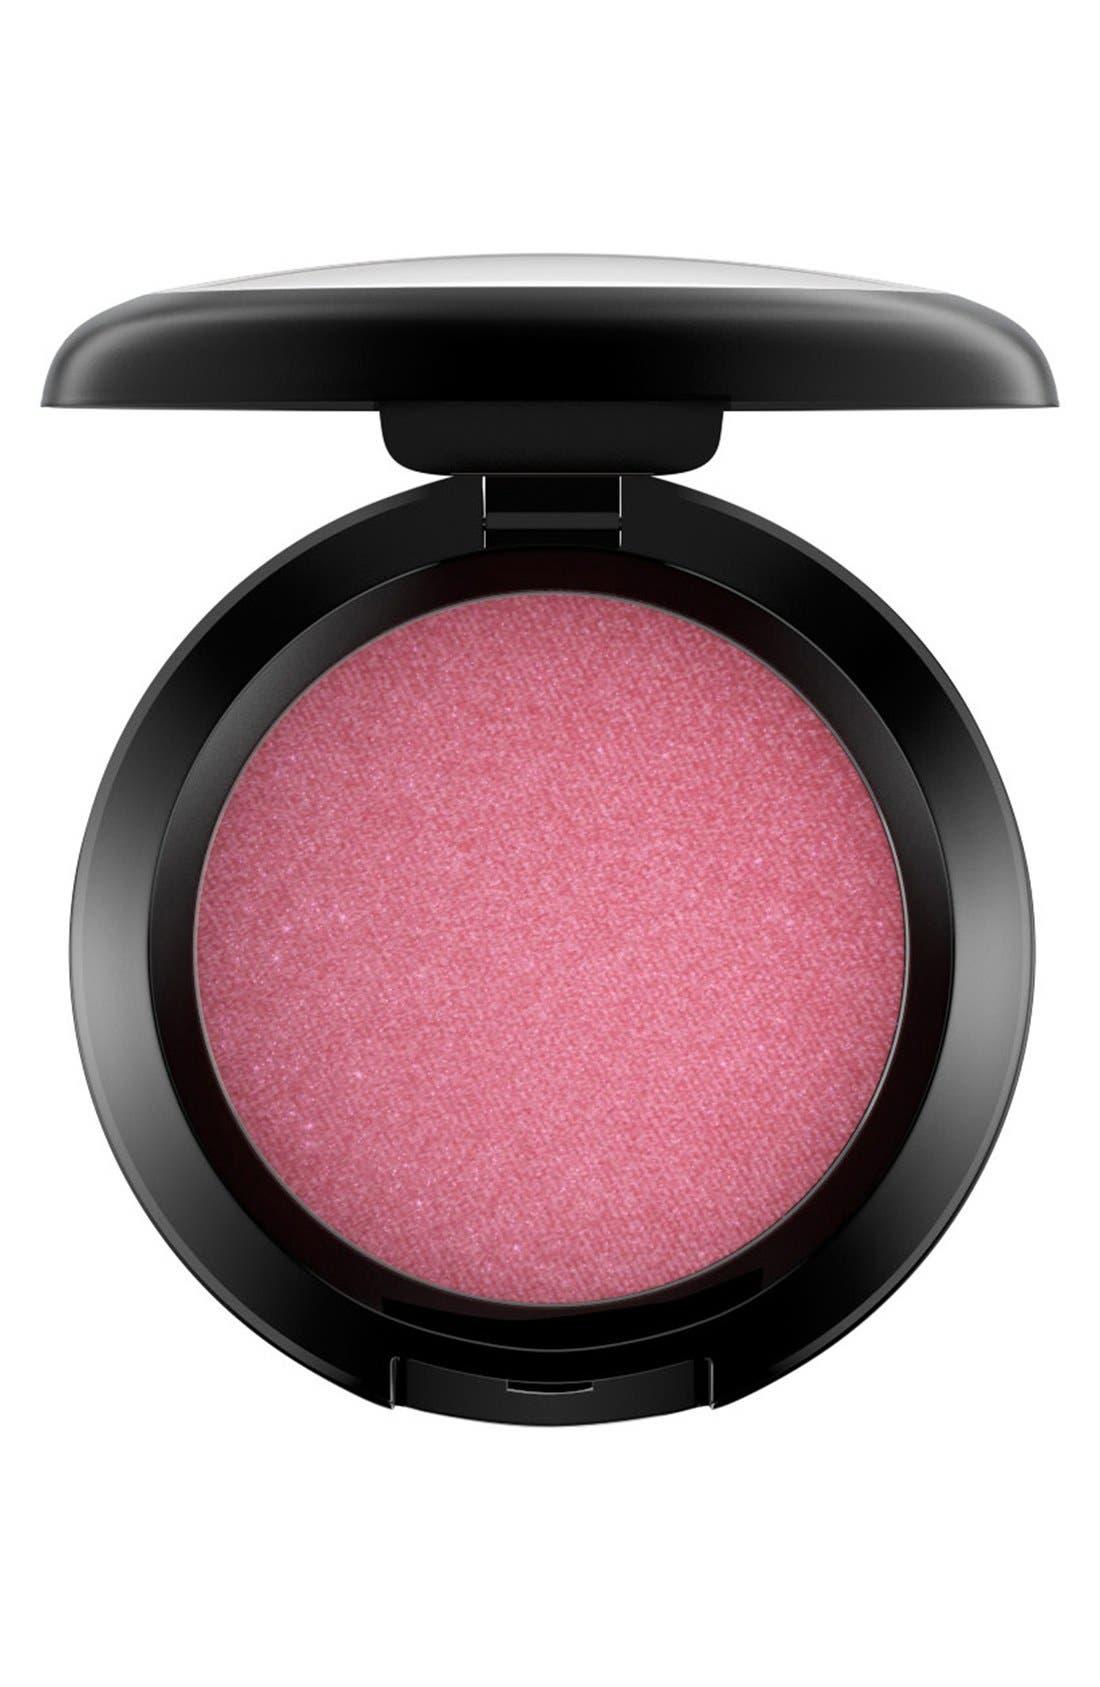 Image of MAC Cosmetics MAC Sheertone Shimmer Blush